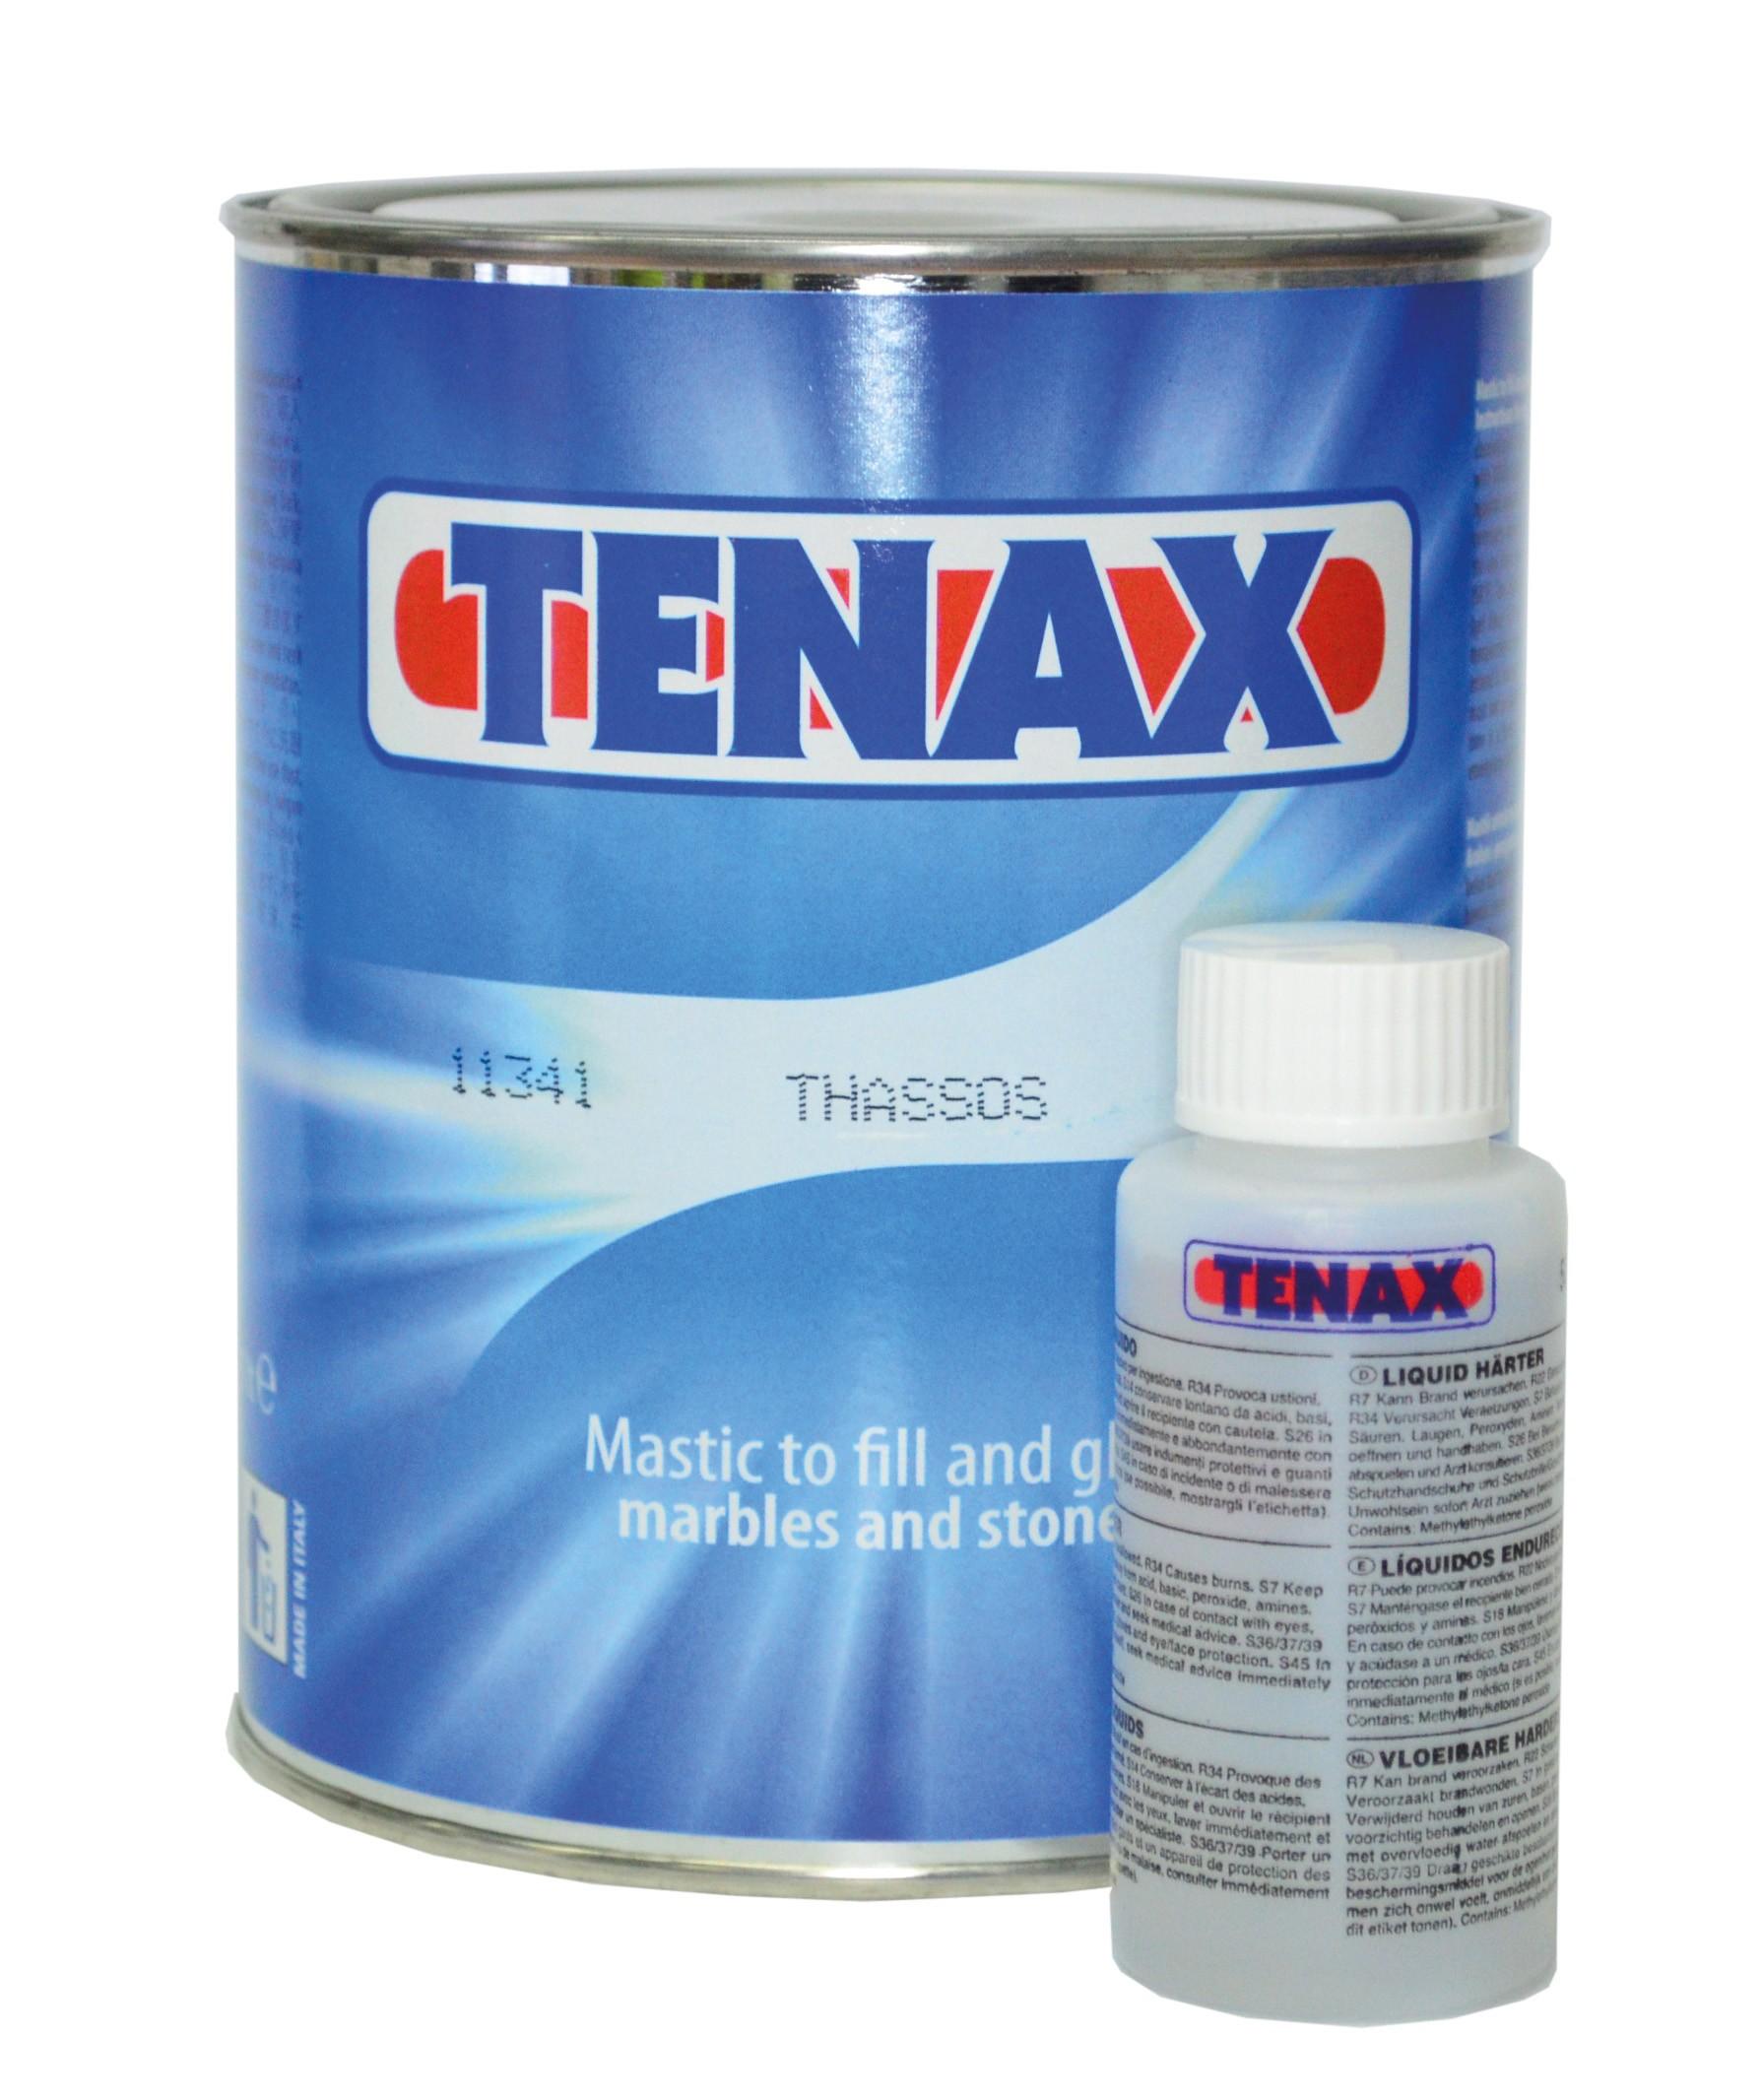 tenax-thassos